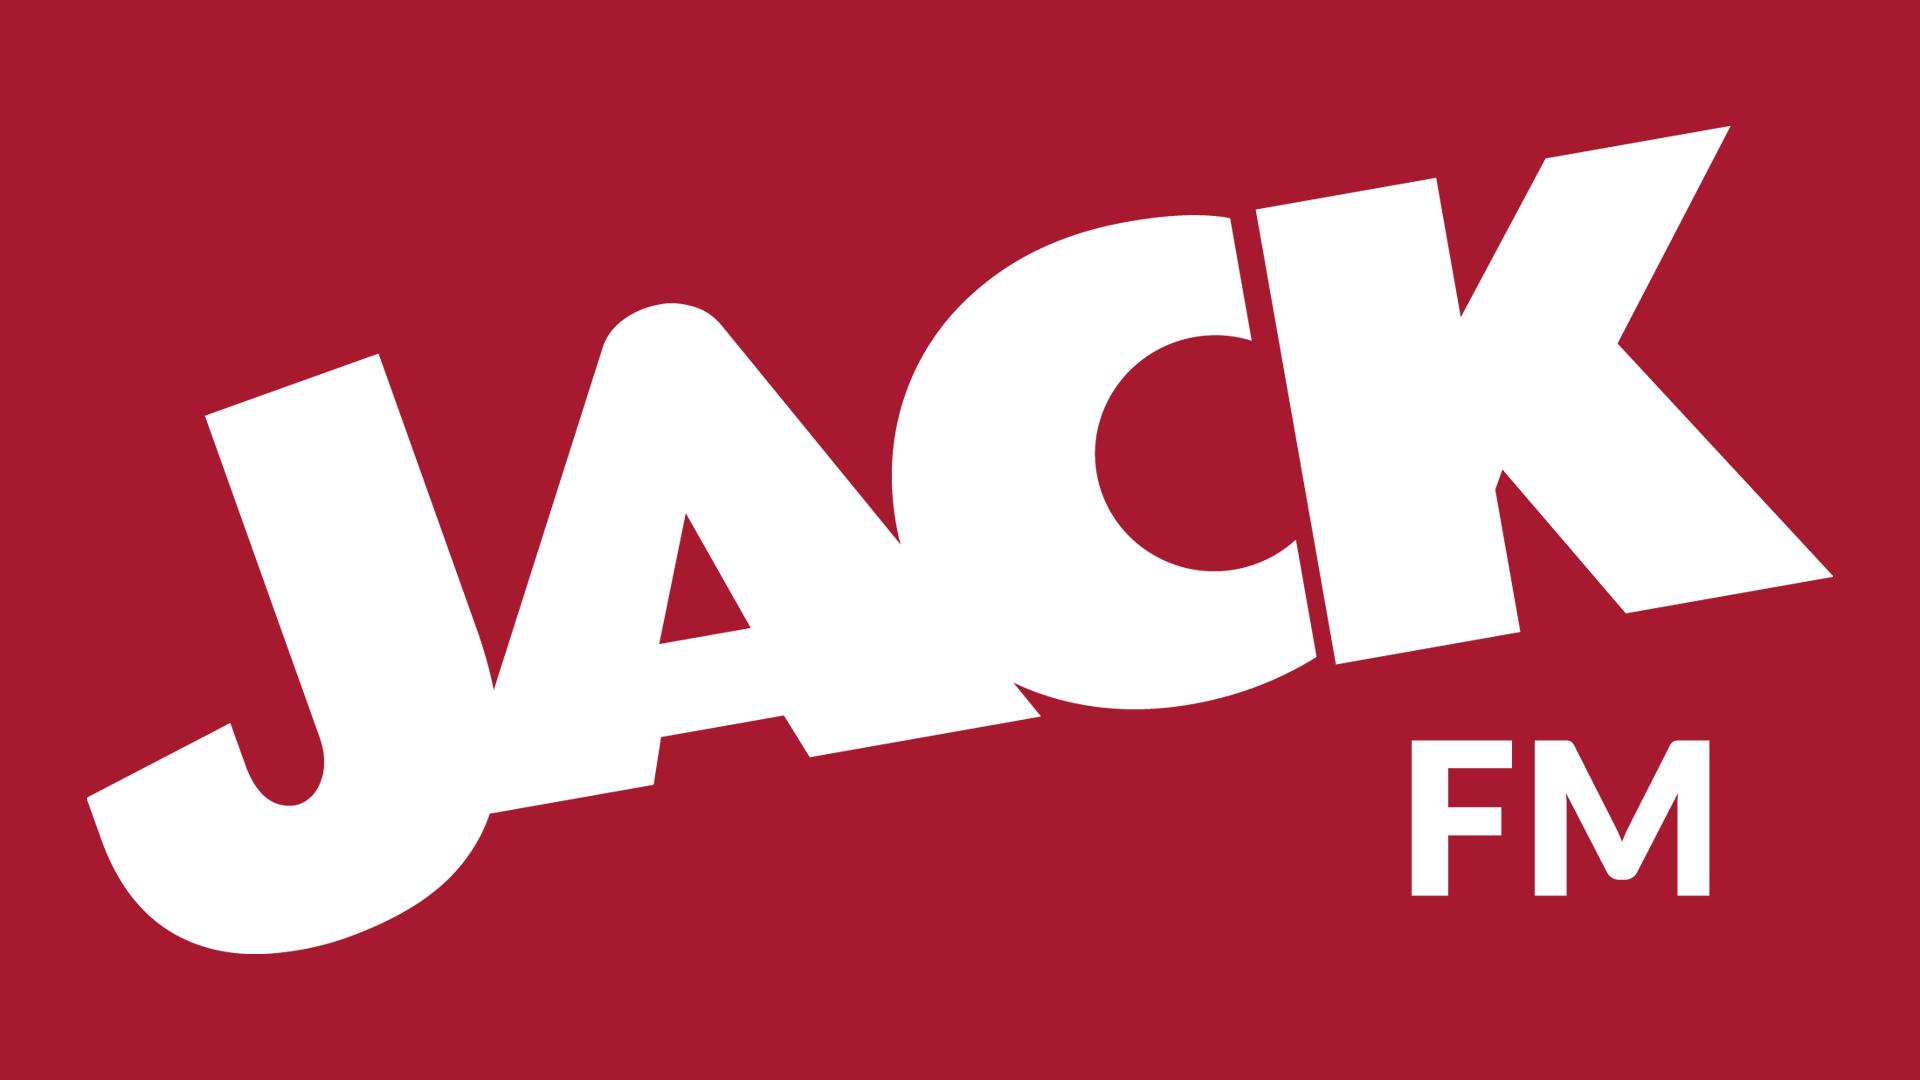 jack fm dating bristol